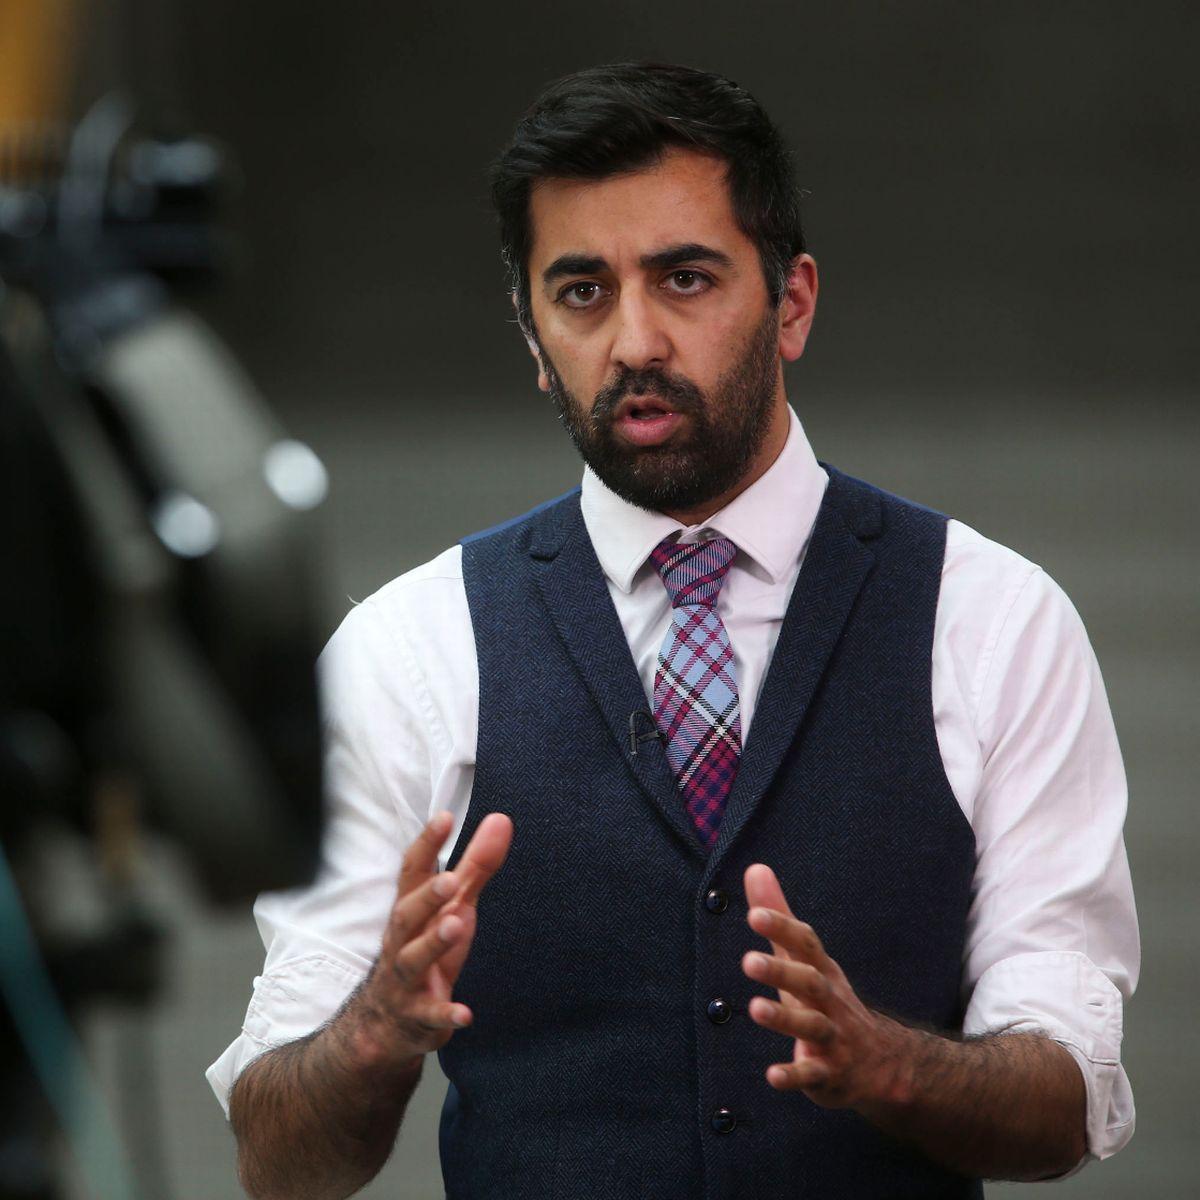 Islamophobic Abuse Directed at Muslim Public Figures in Scotland